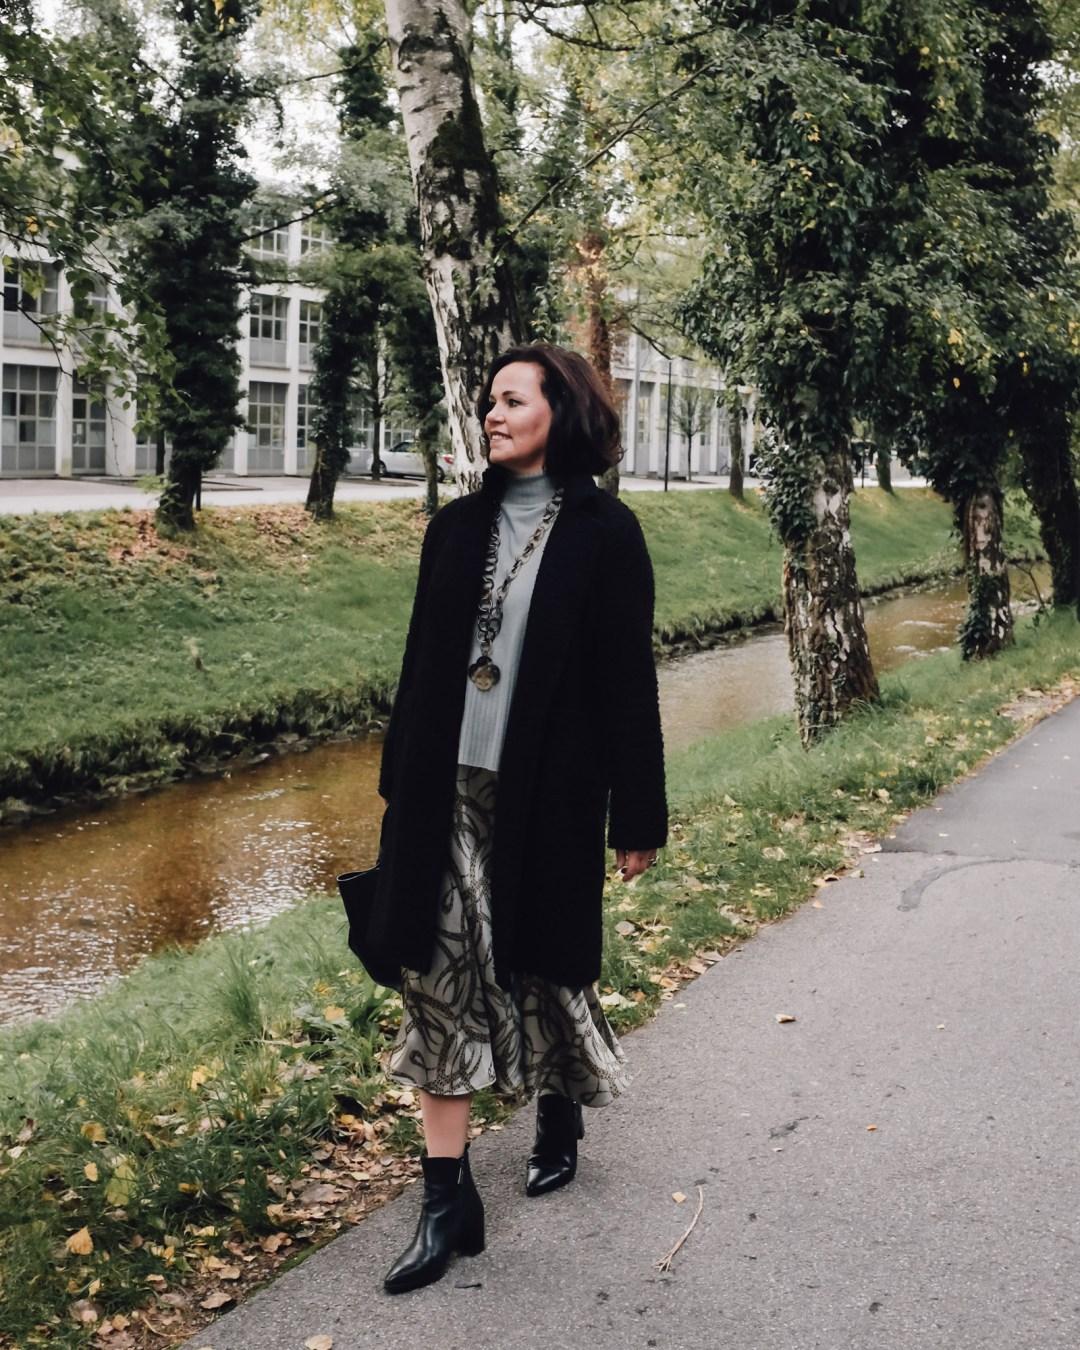 Inastil, Hermbstmode, Rock, Salbeigrün, Mintgrün, Autumnfashion, Modeberatung, Ue50Mode, Üe50blogger, Modeblogger-2